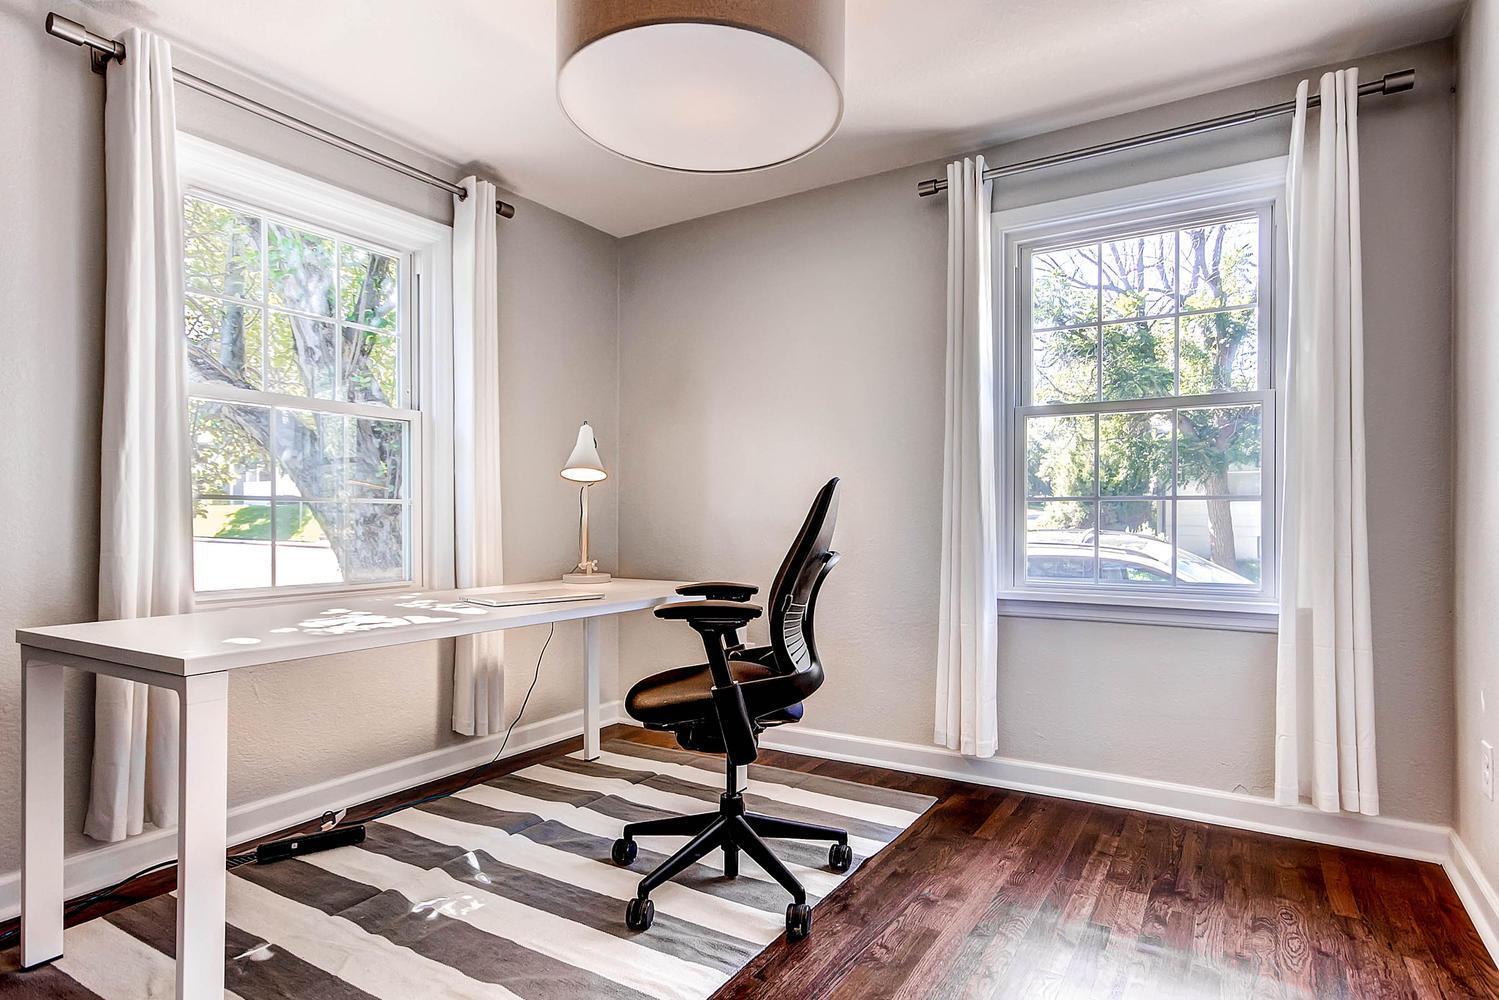 3297 S Lafayette St Englewood-large-019-Bedroom-1500x1000-72dpi.jpg